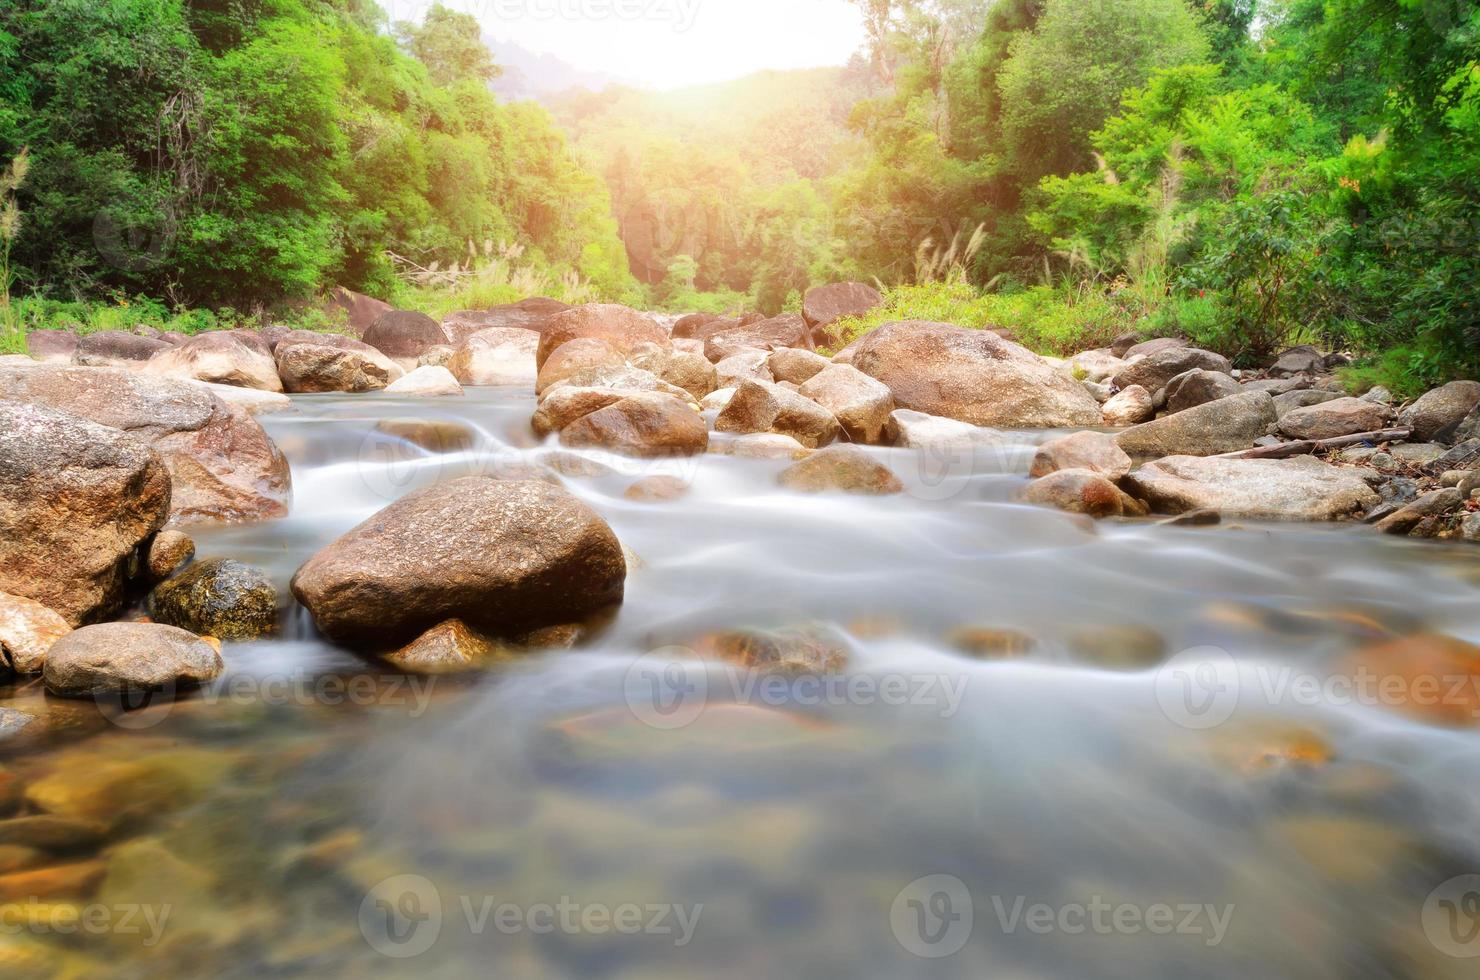 manora pequena cachoeira e rocha na floresta tropical foto